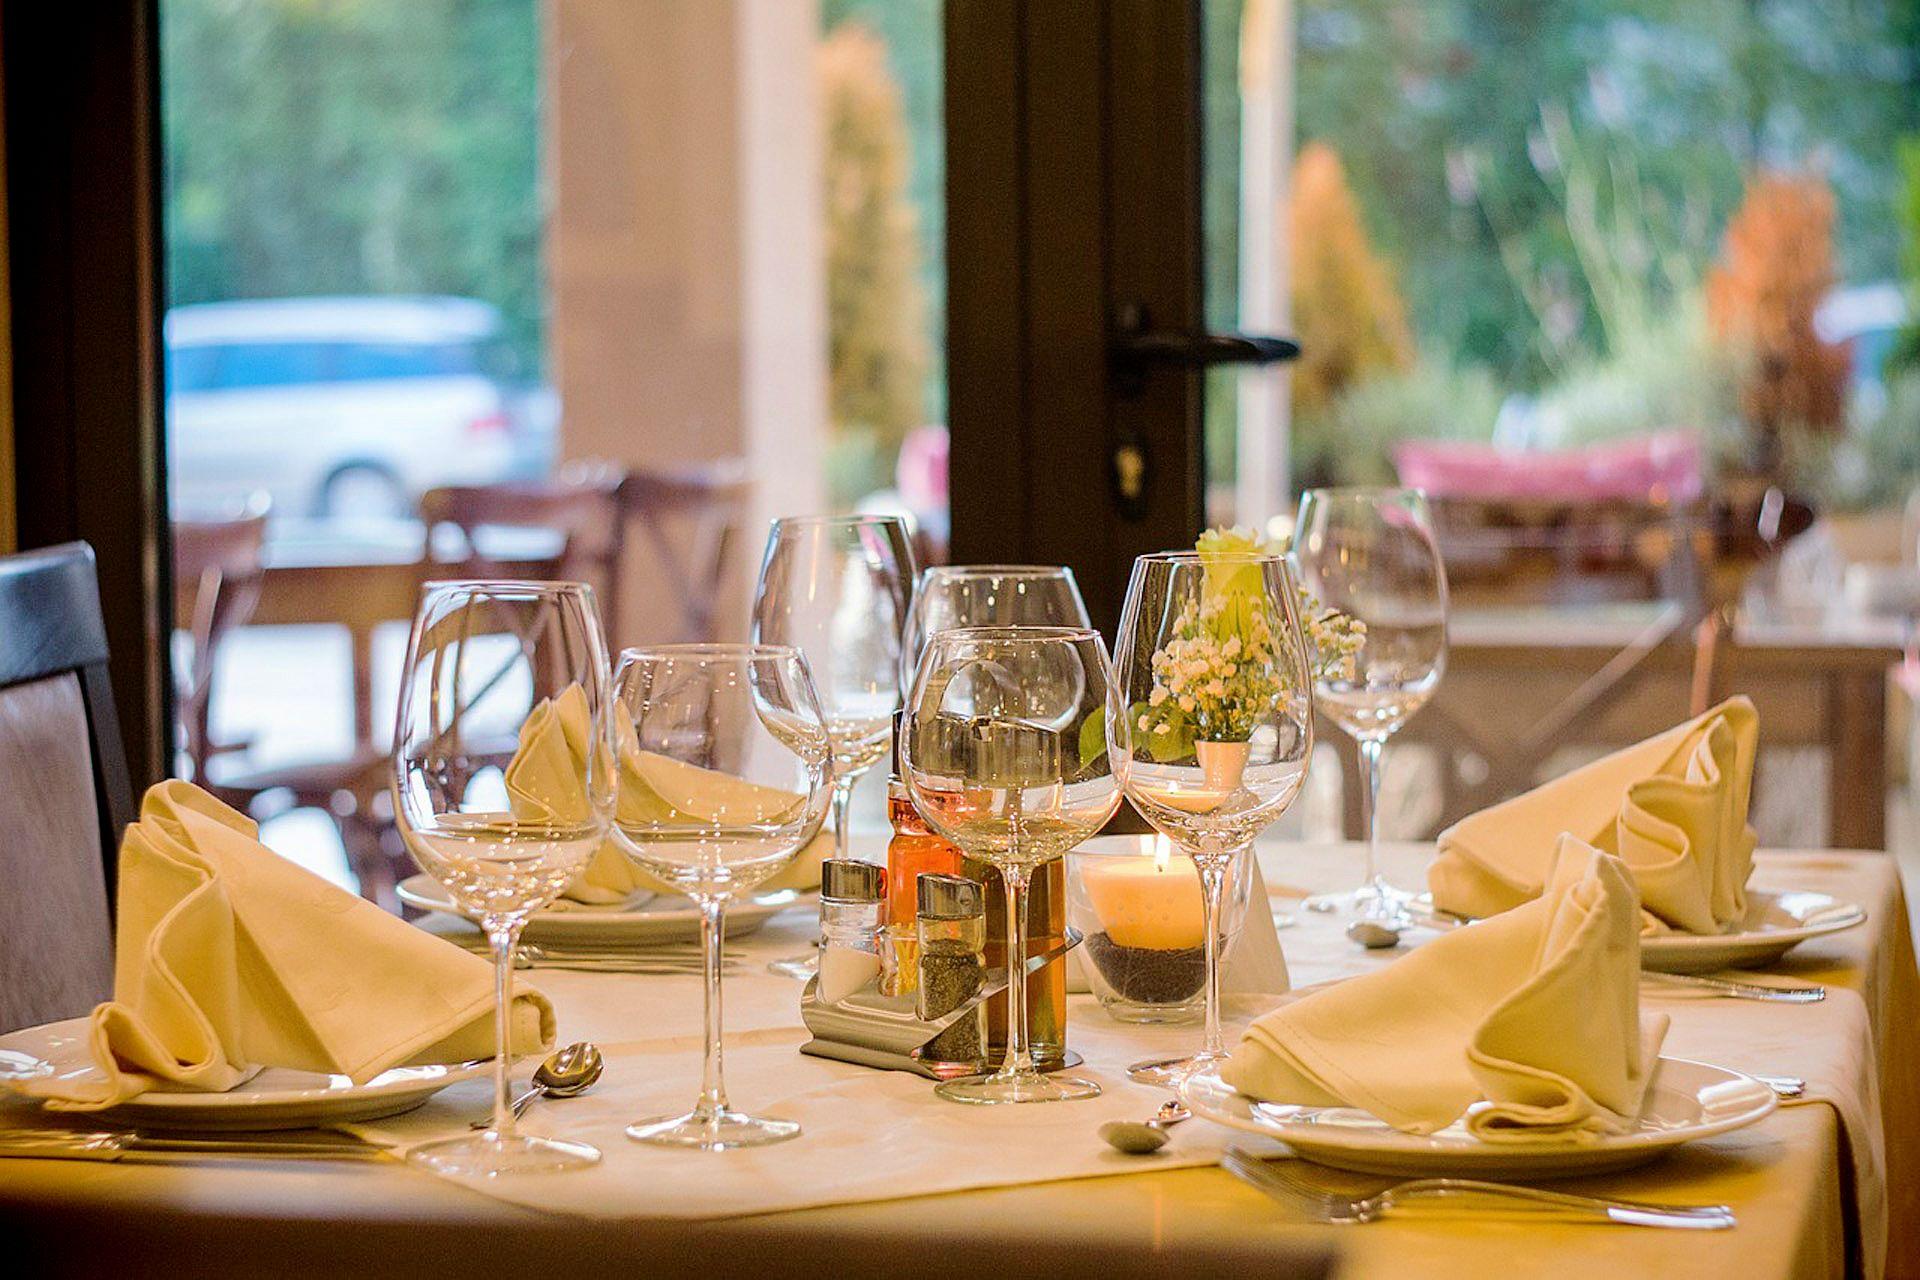 apulia-slow-travel-ceglie-messapica-temple-of-gastronomy-willkommensessen-enogastronomie-welcome dinner